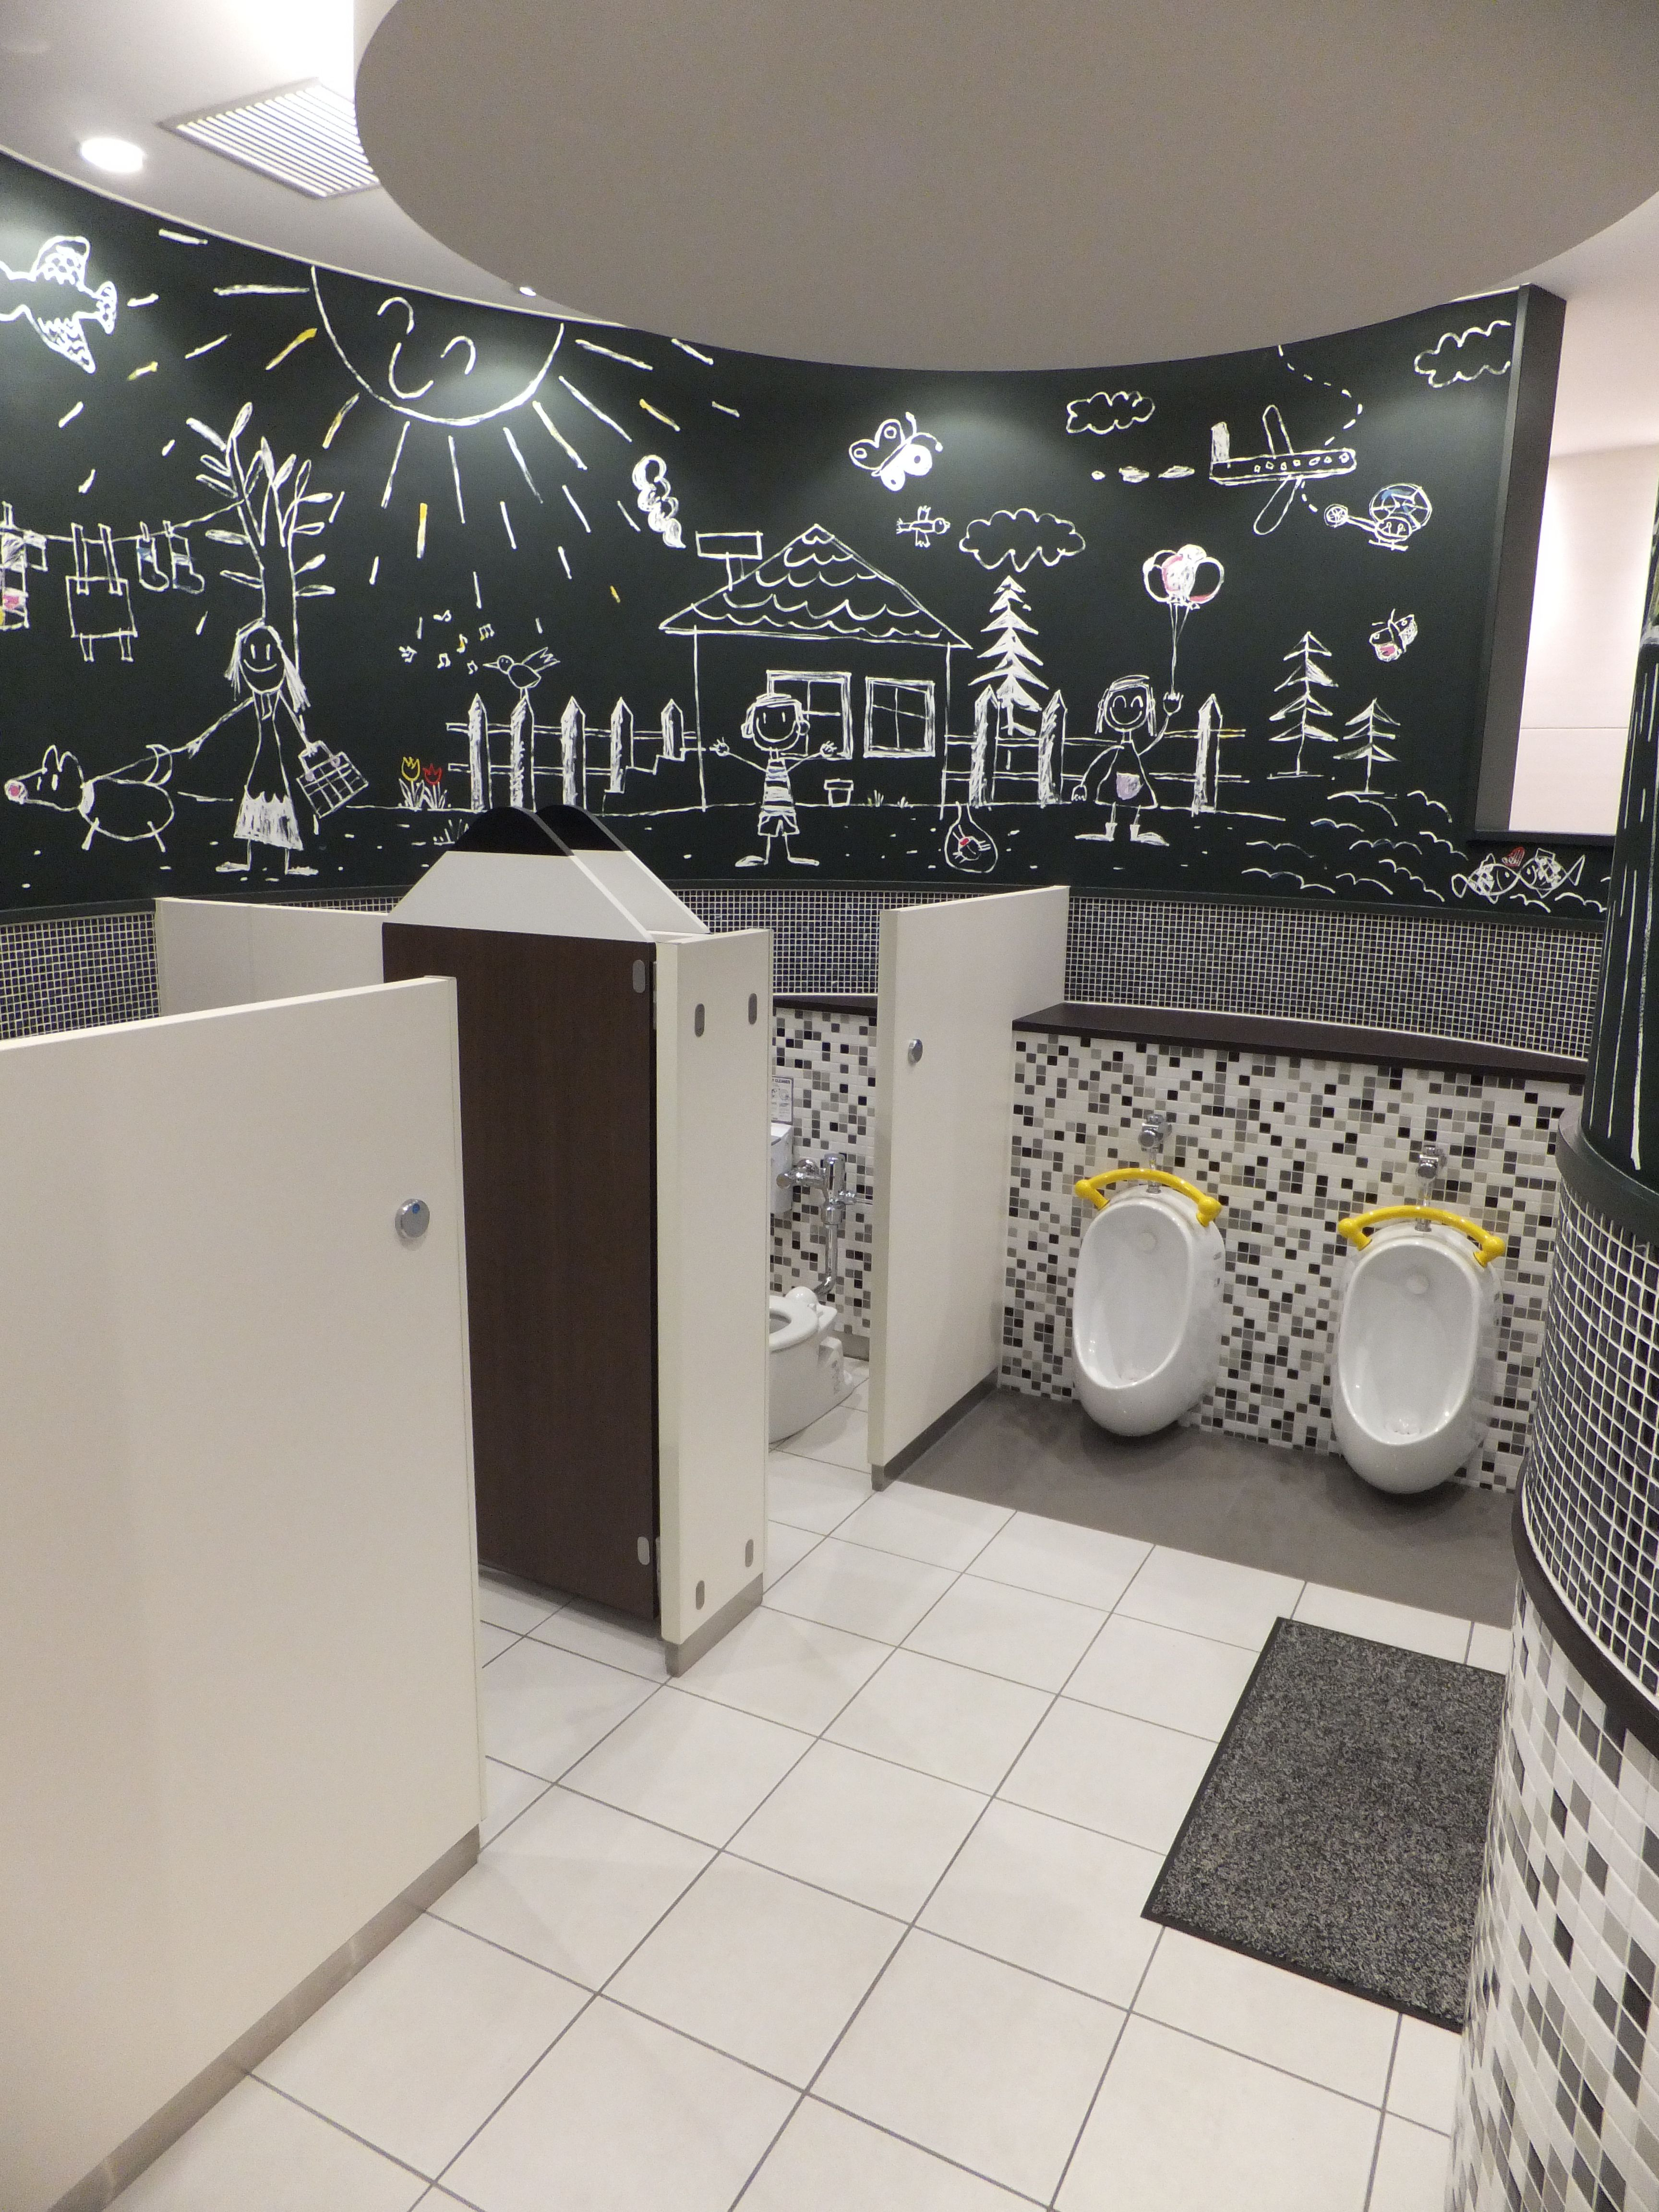 School Bathroom Toilet